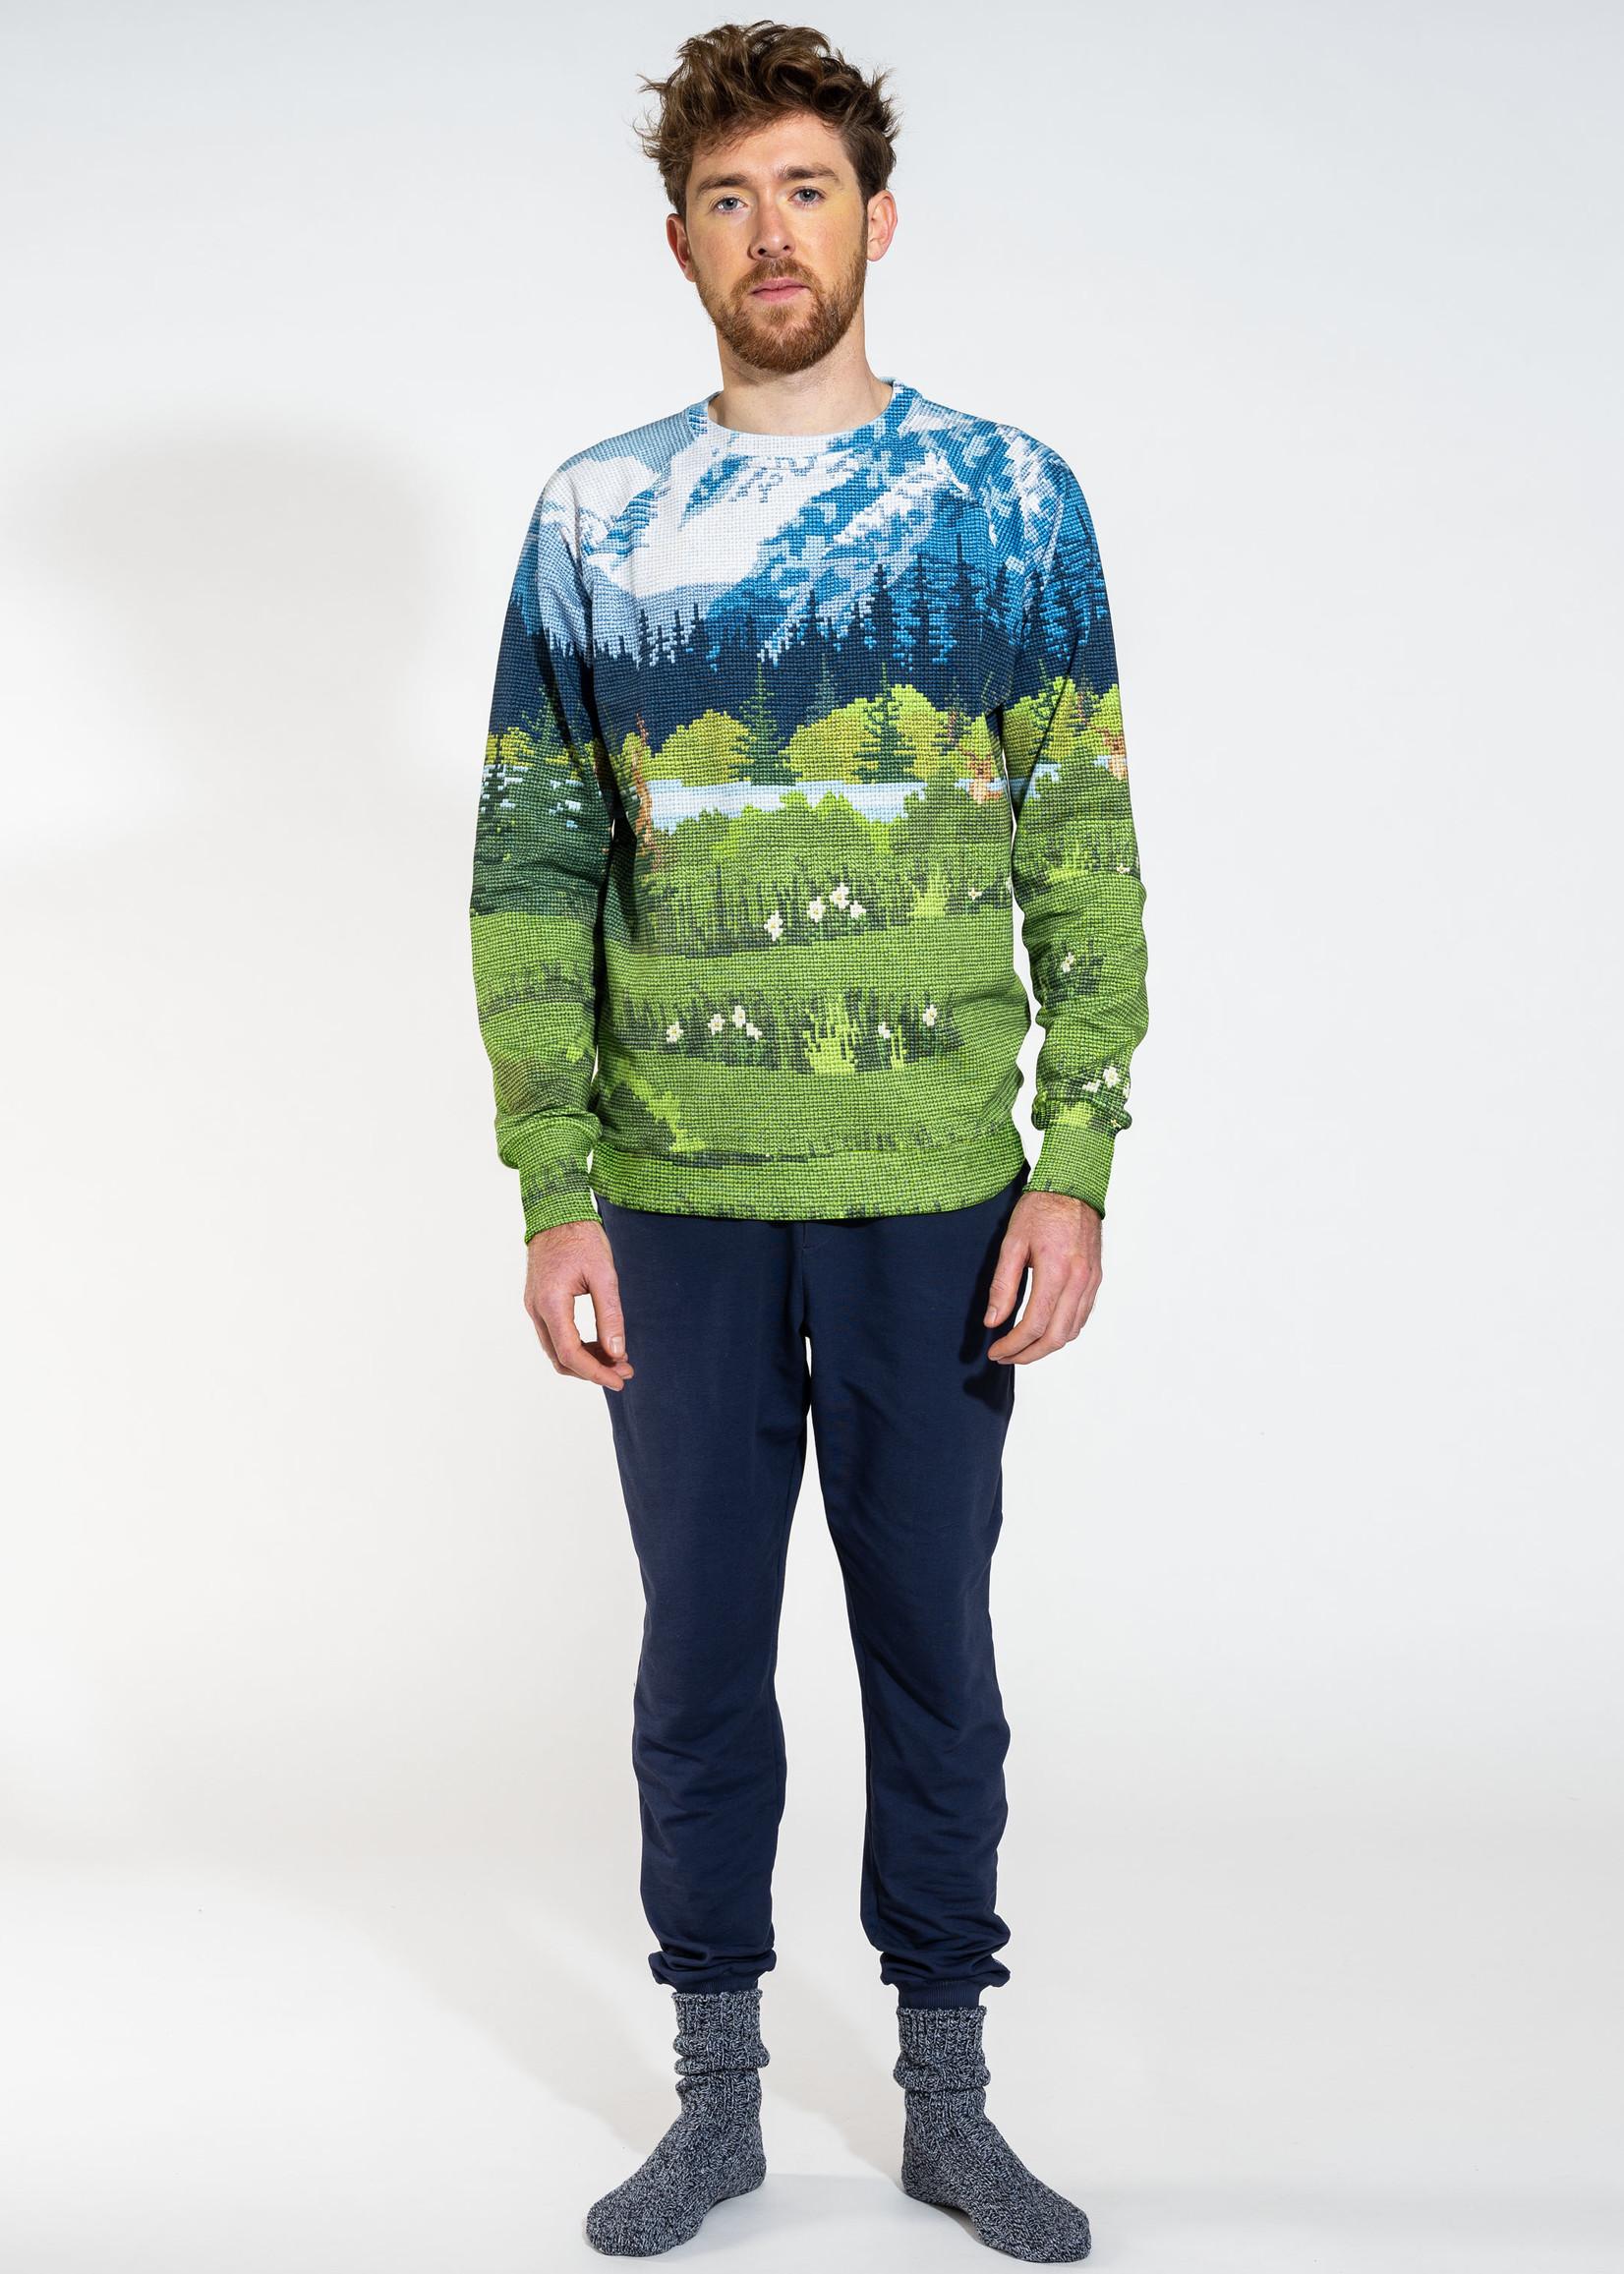 Snurk Across the Alps Sweater